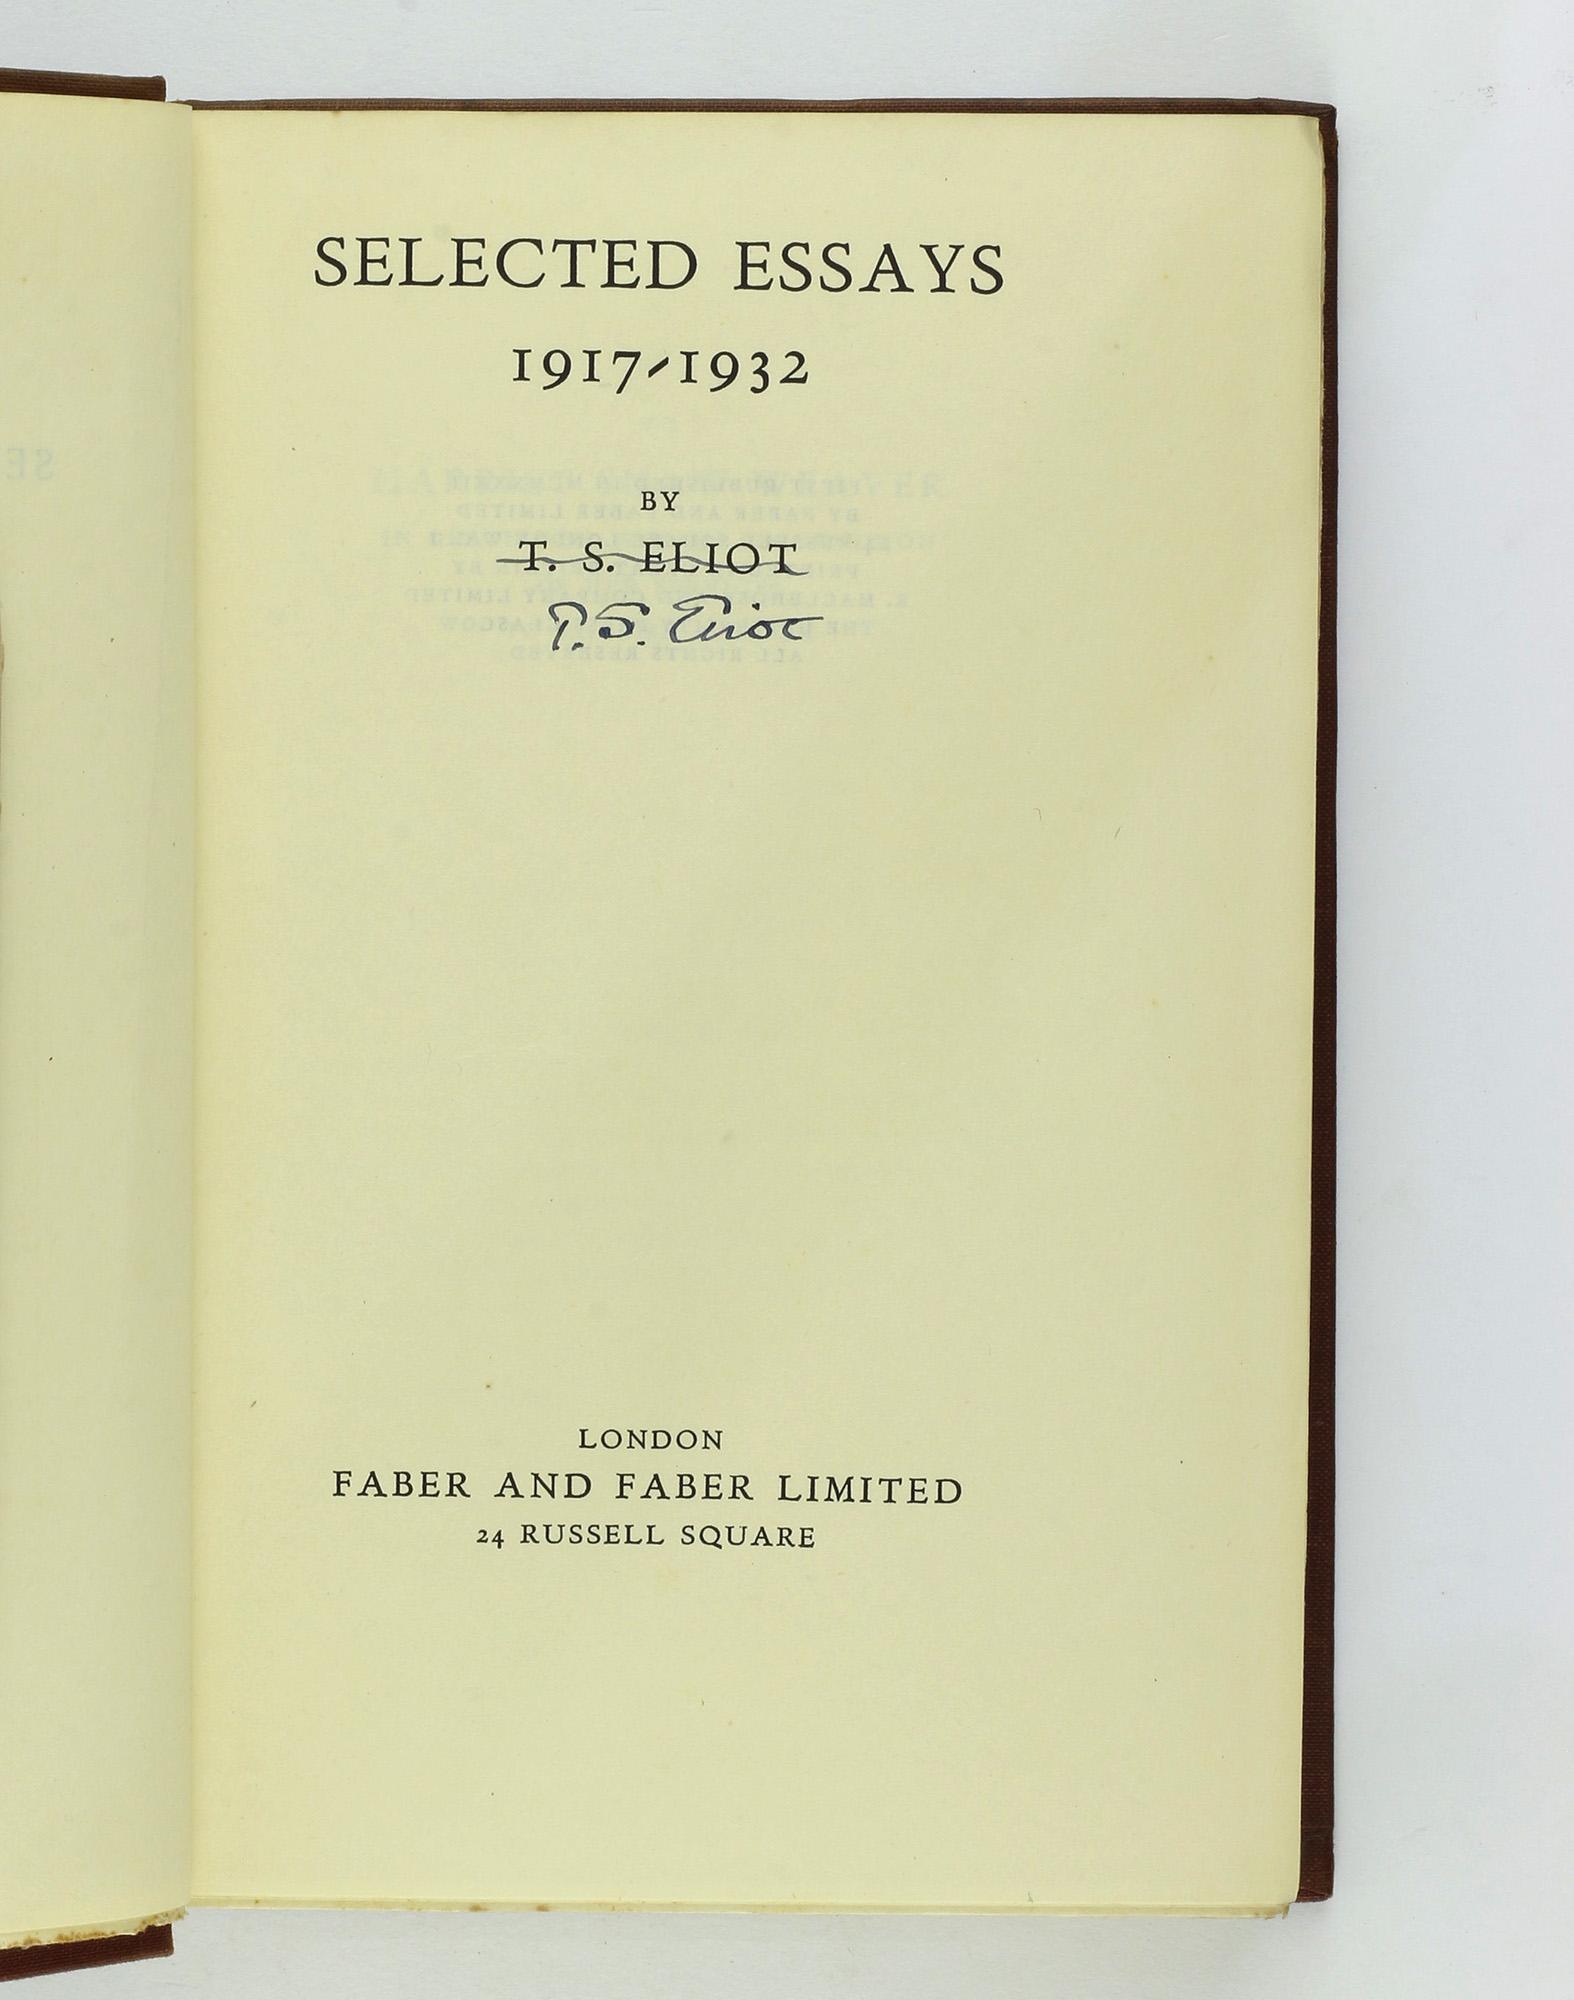 t s eliot selected essays faber